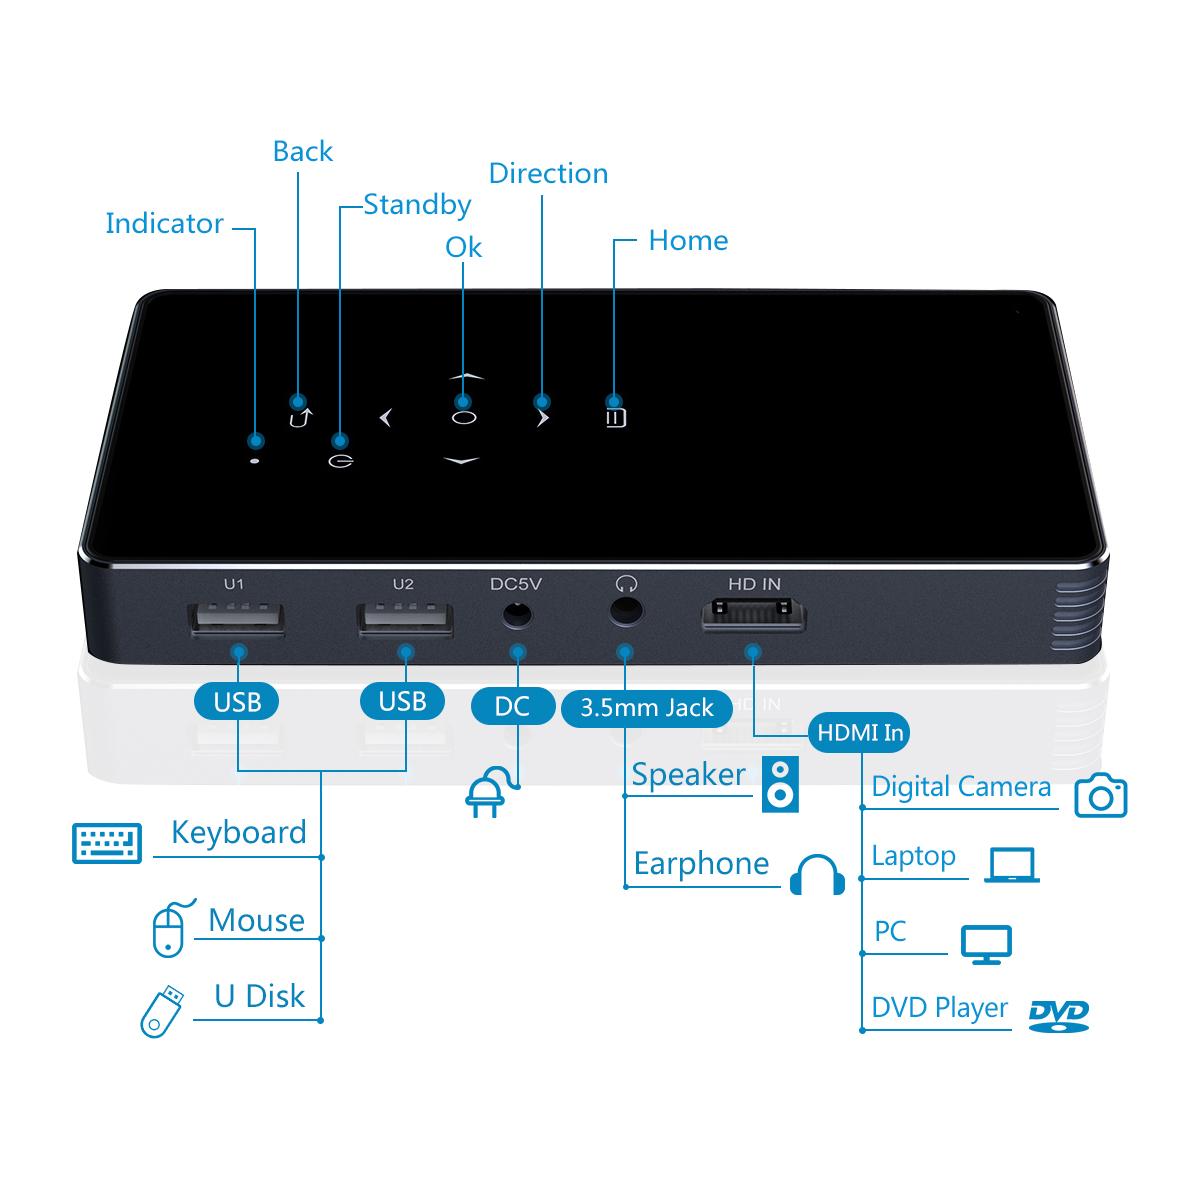 Latest Mini Projector, Home Theater Smart Video DLP Projector  Android 7.1  1080P Wi-Fi BT HDMI USB TF Card Wireless Display